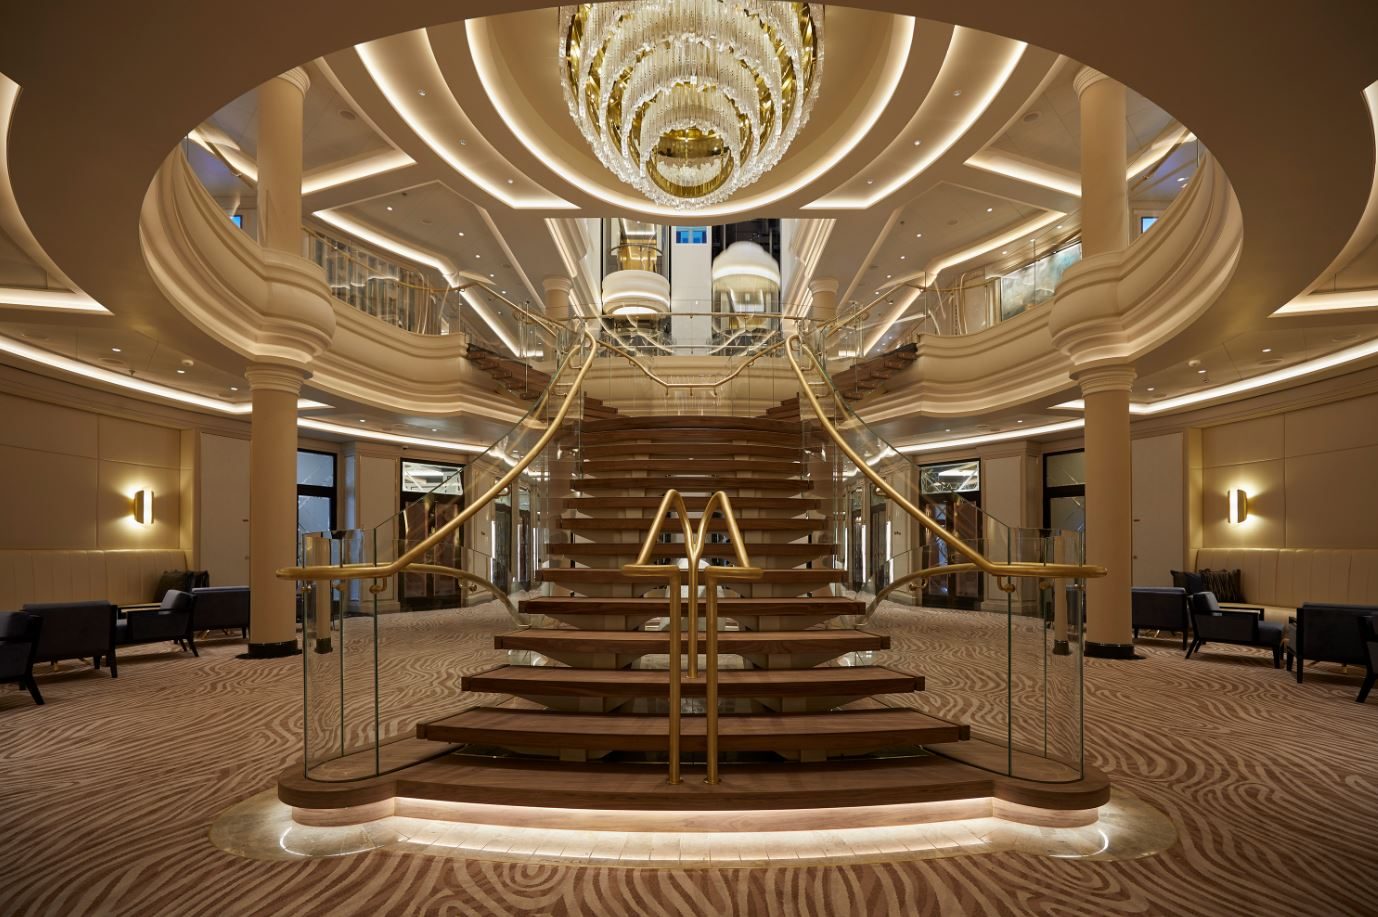 Seven Seas Splendor - Atrium 2